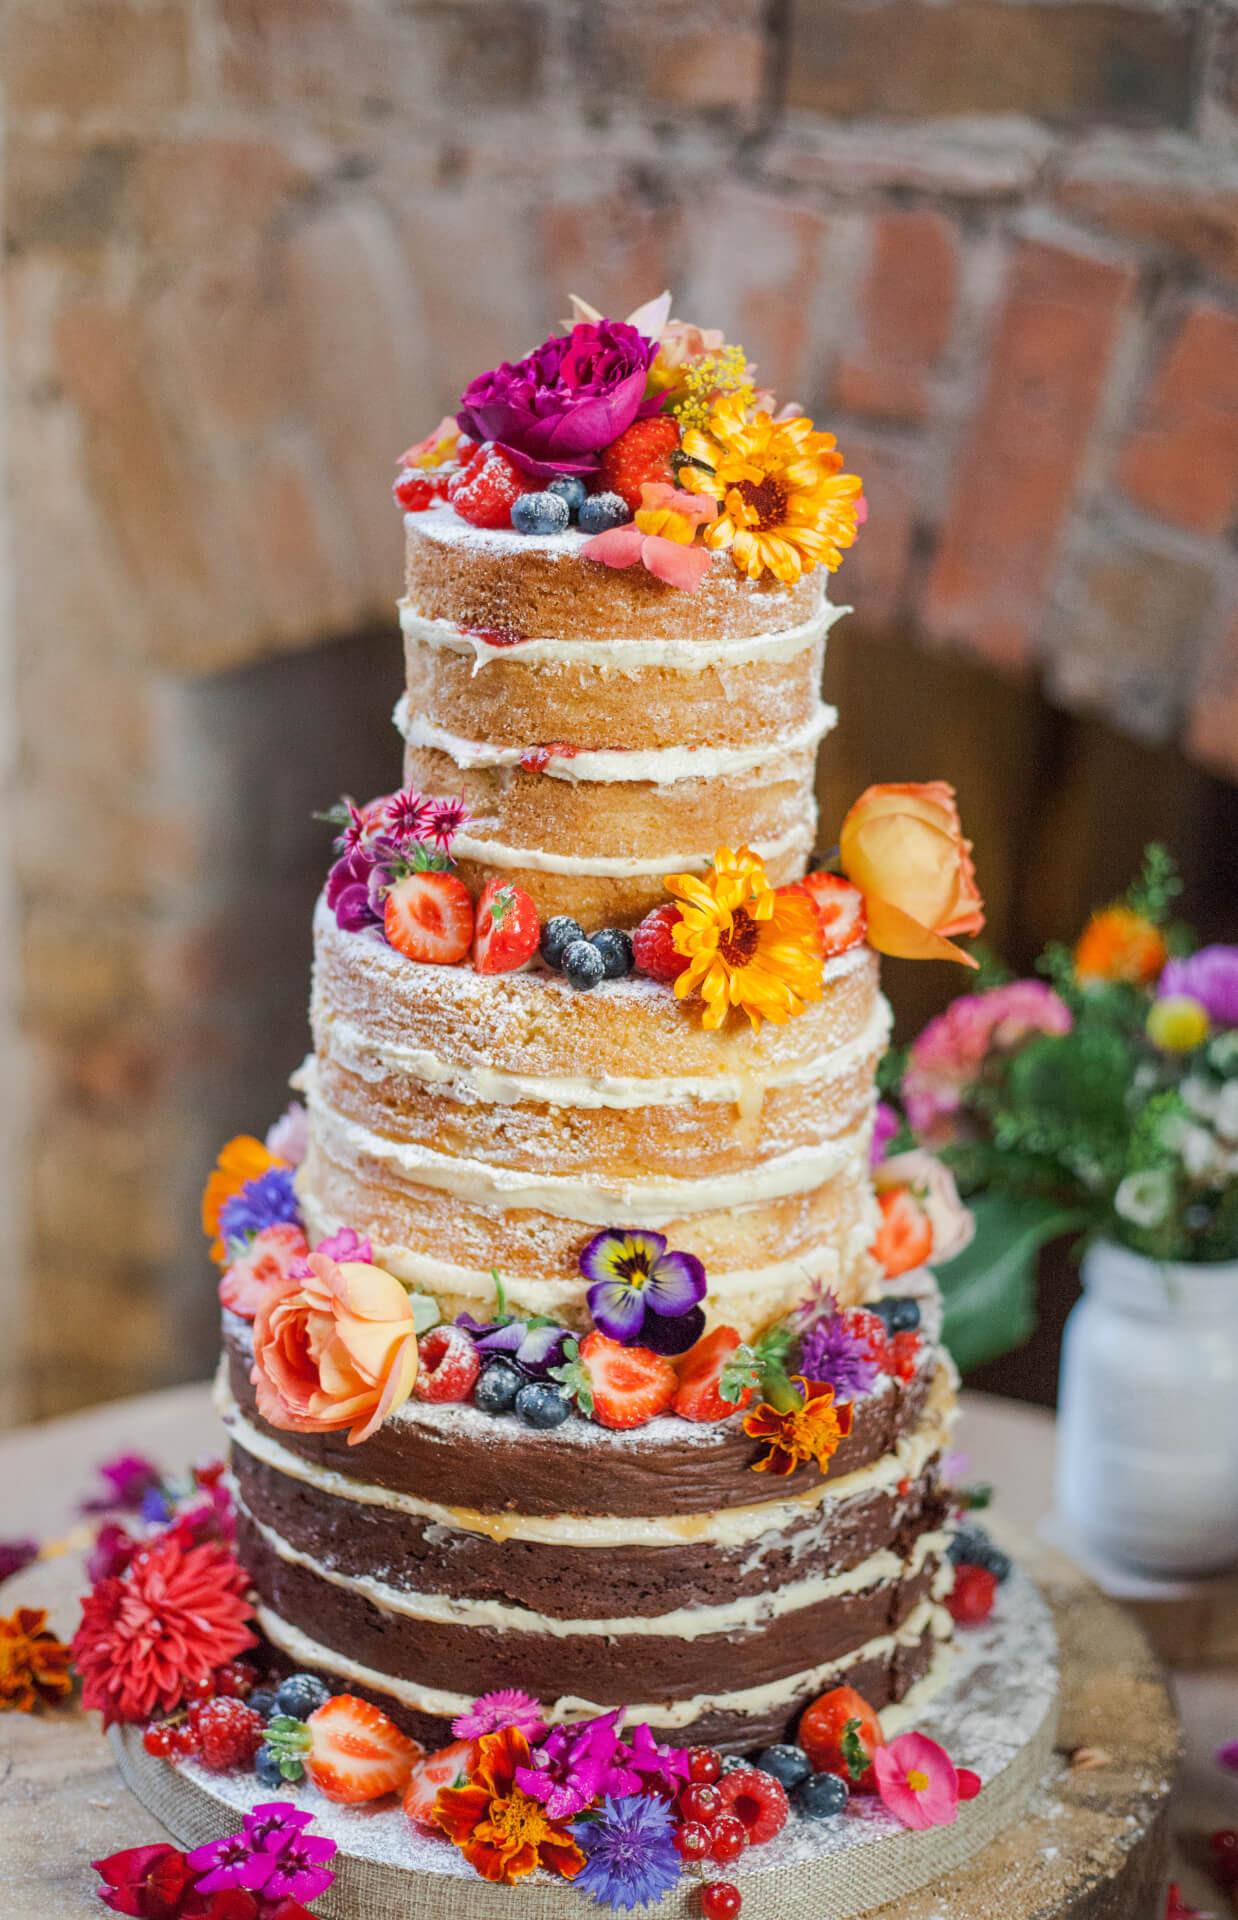 Wedding Cakes Flowers  Edible Flowers for Naked Wedding Cakes Fresh Edible